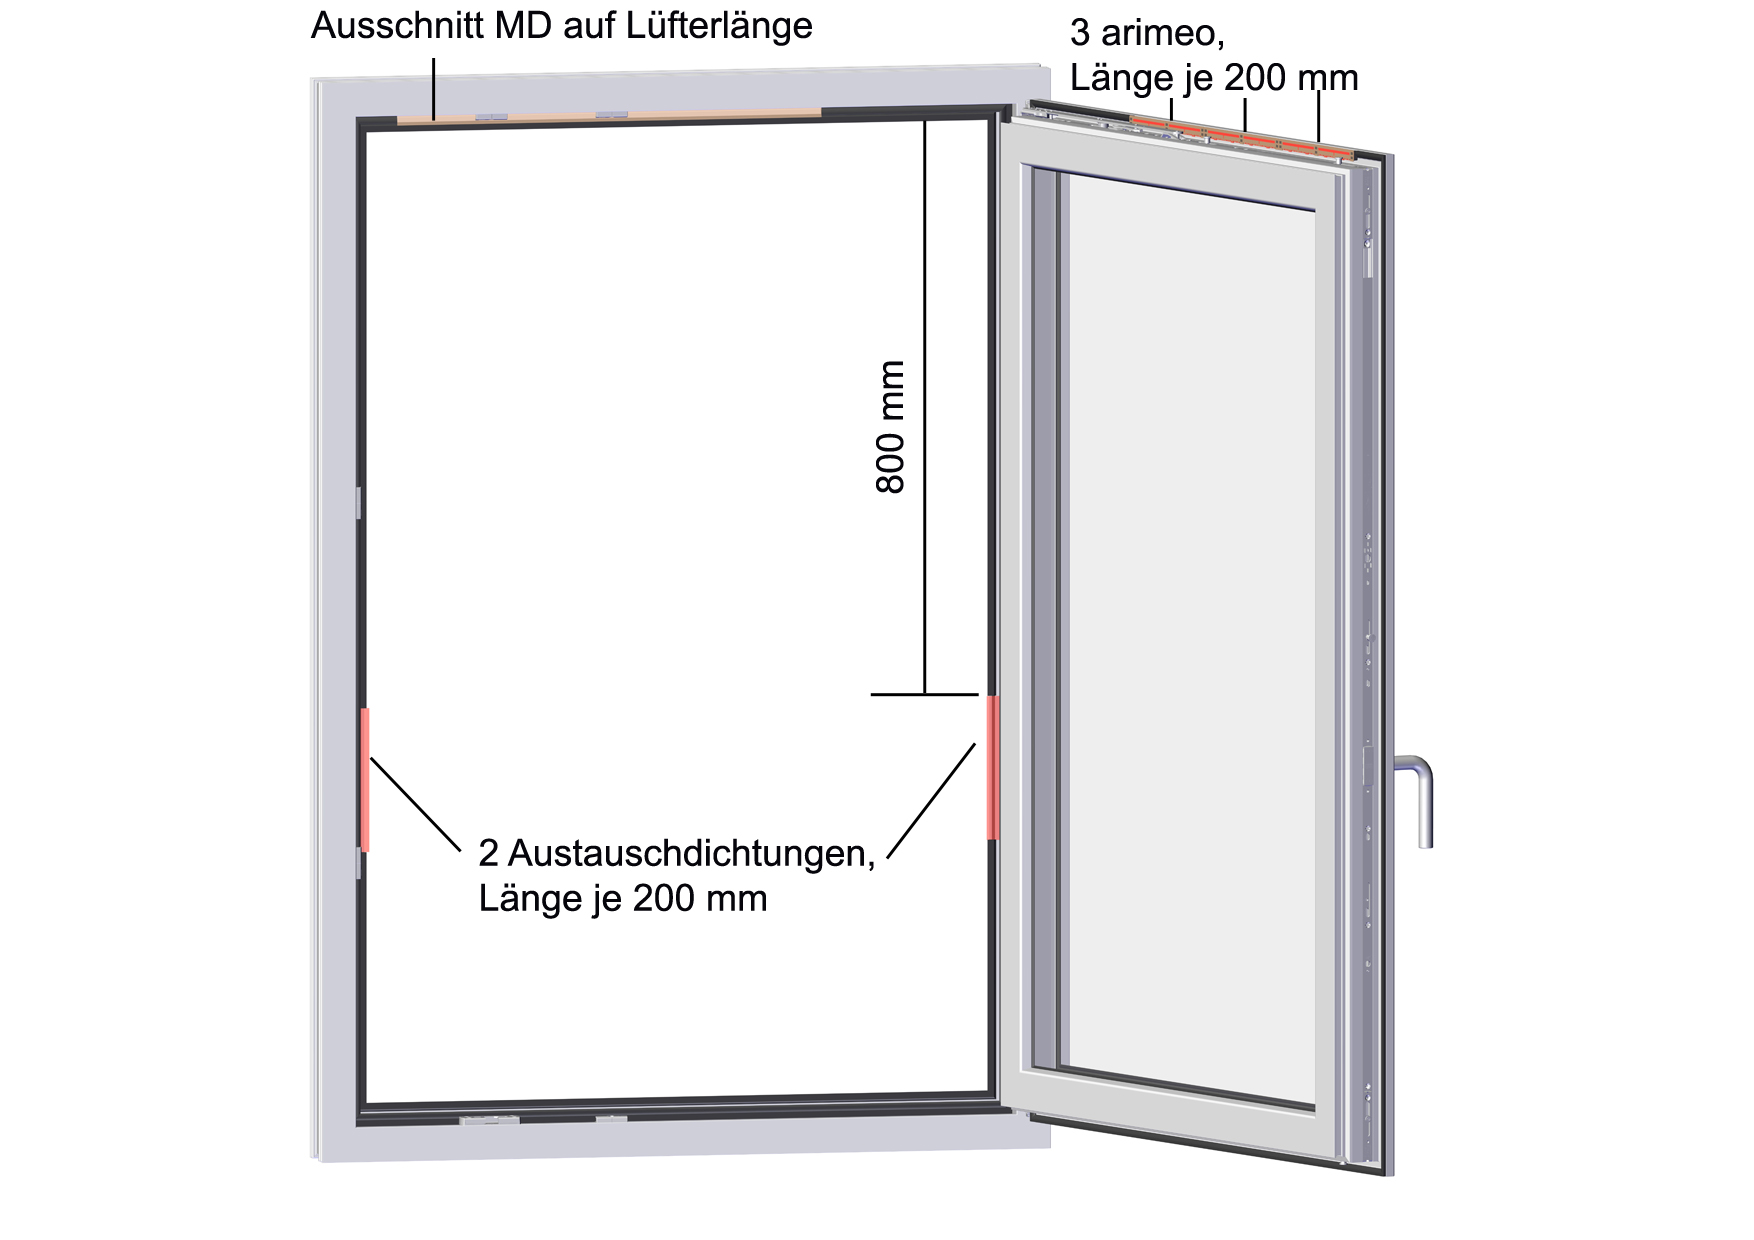 arimeo classic S Fensterfalzlüfter Einbauvariante triple acoustic MD